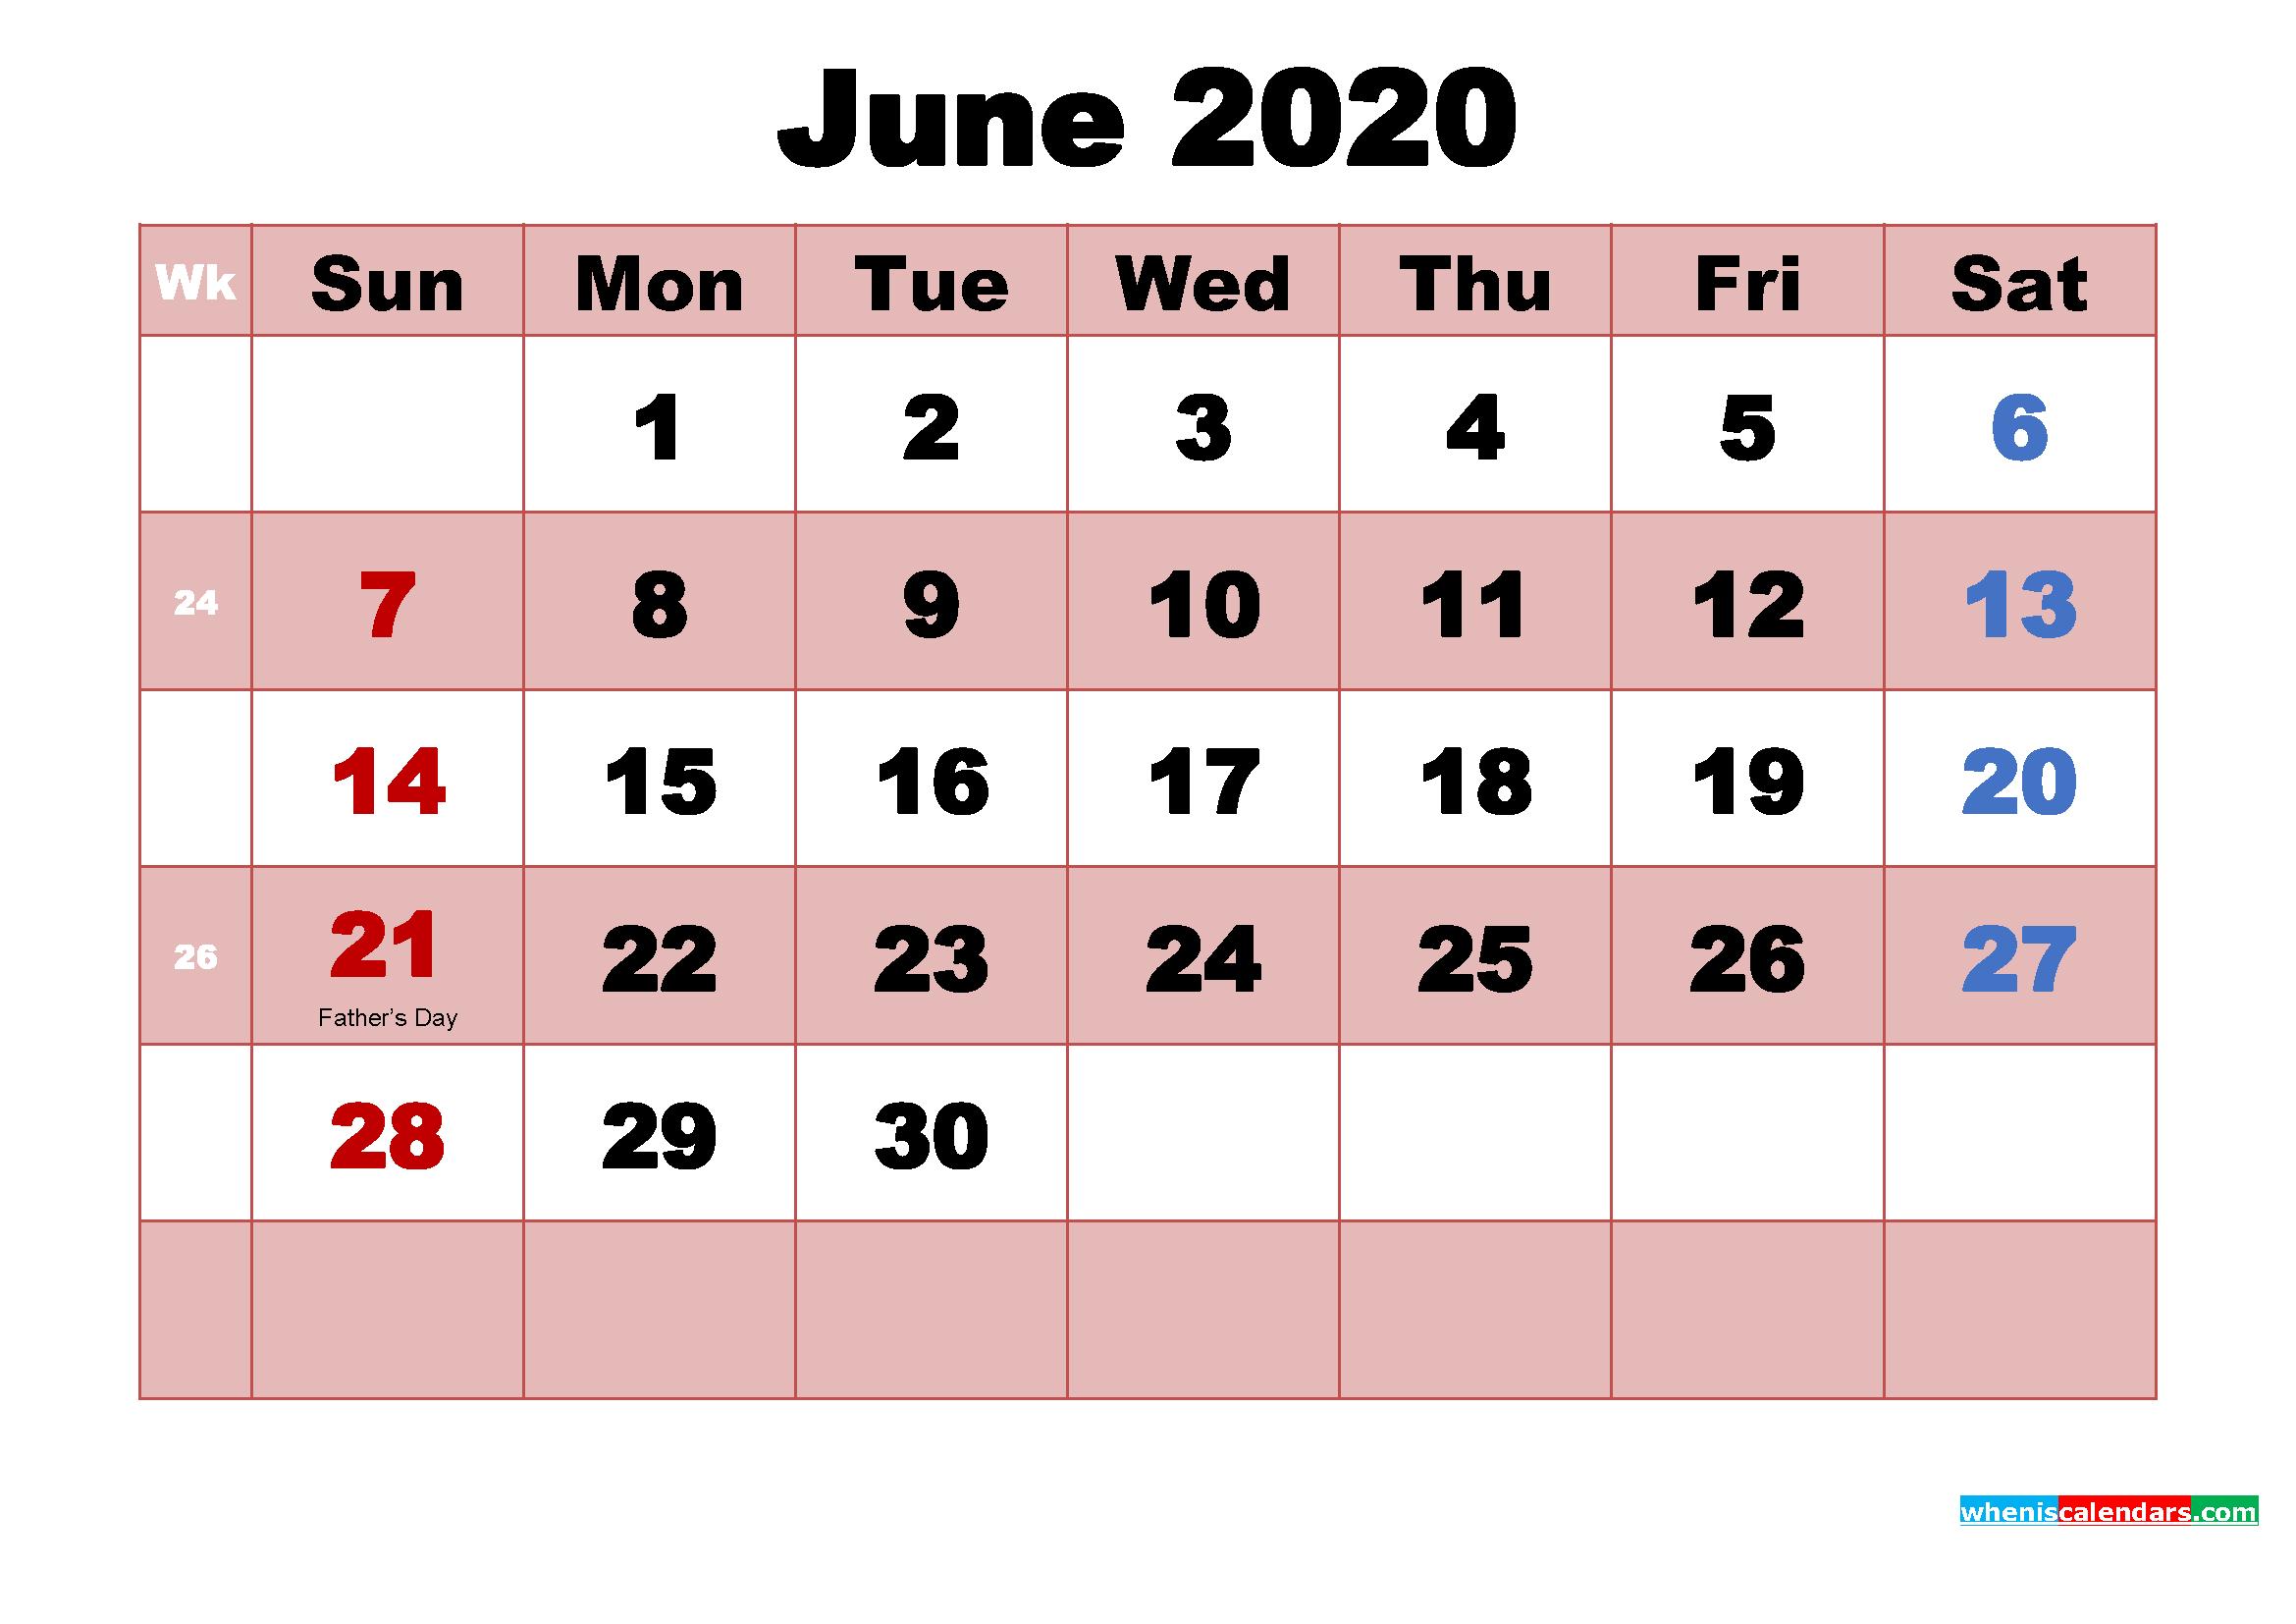 June 2020 Calendar with Holidays Wallpaper